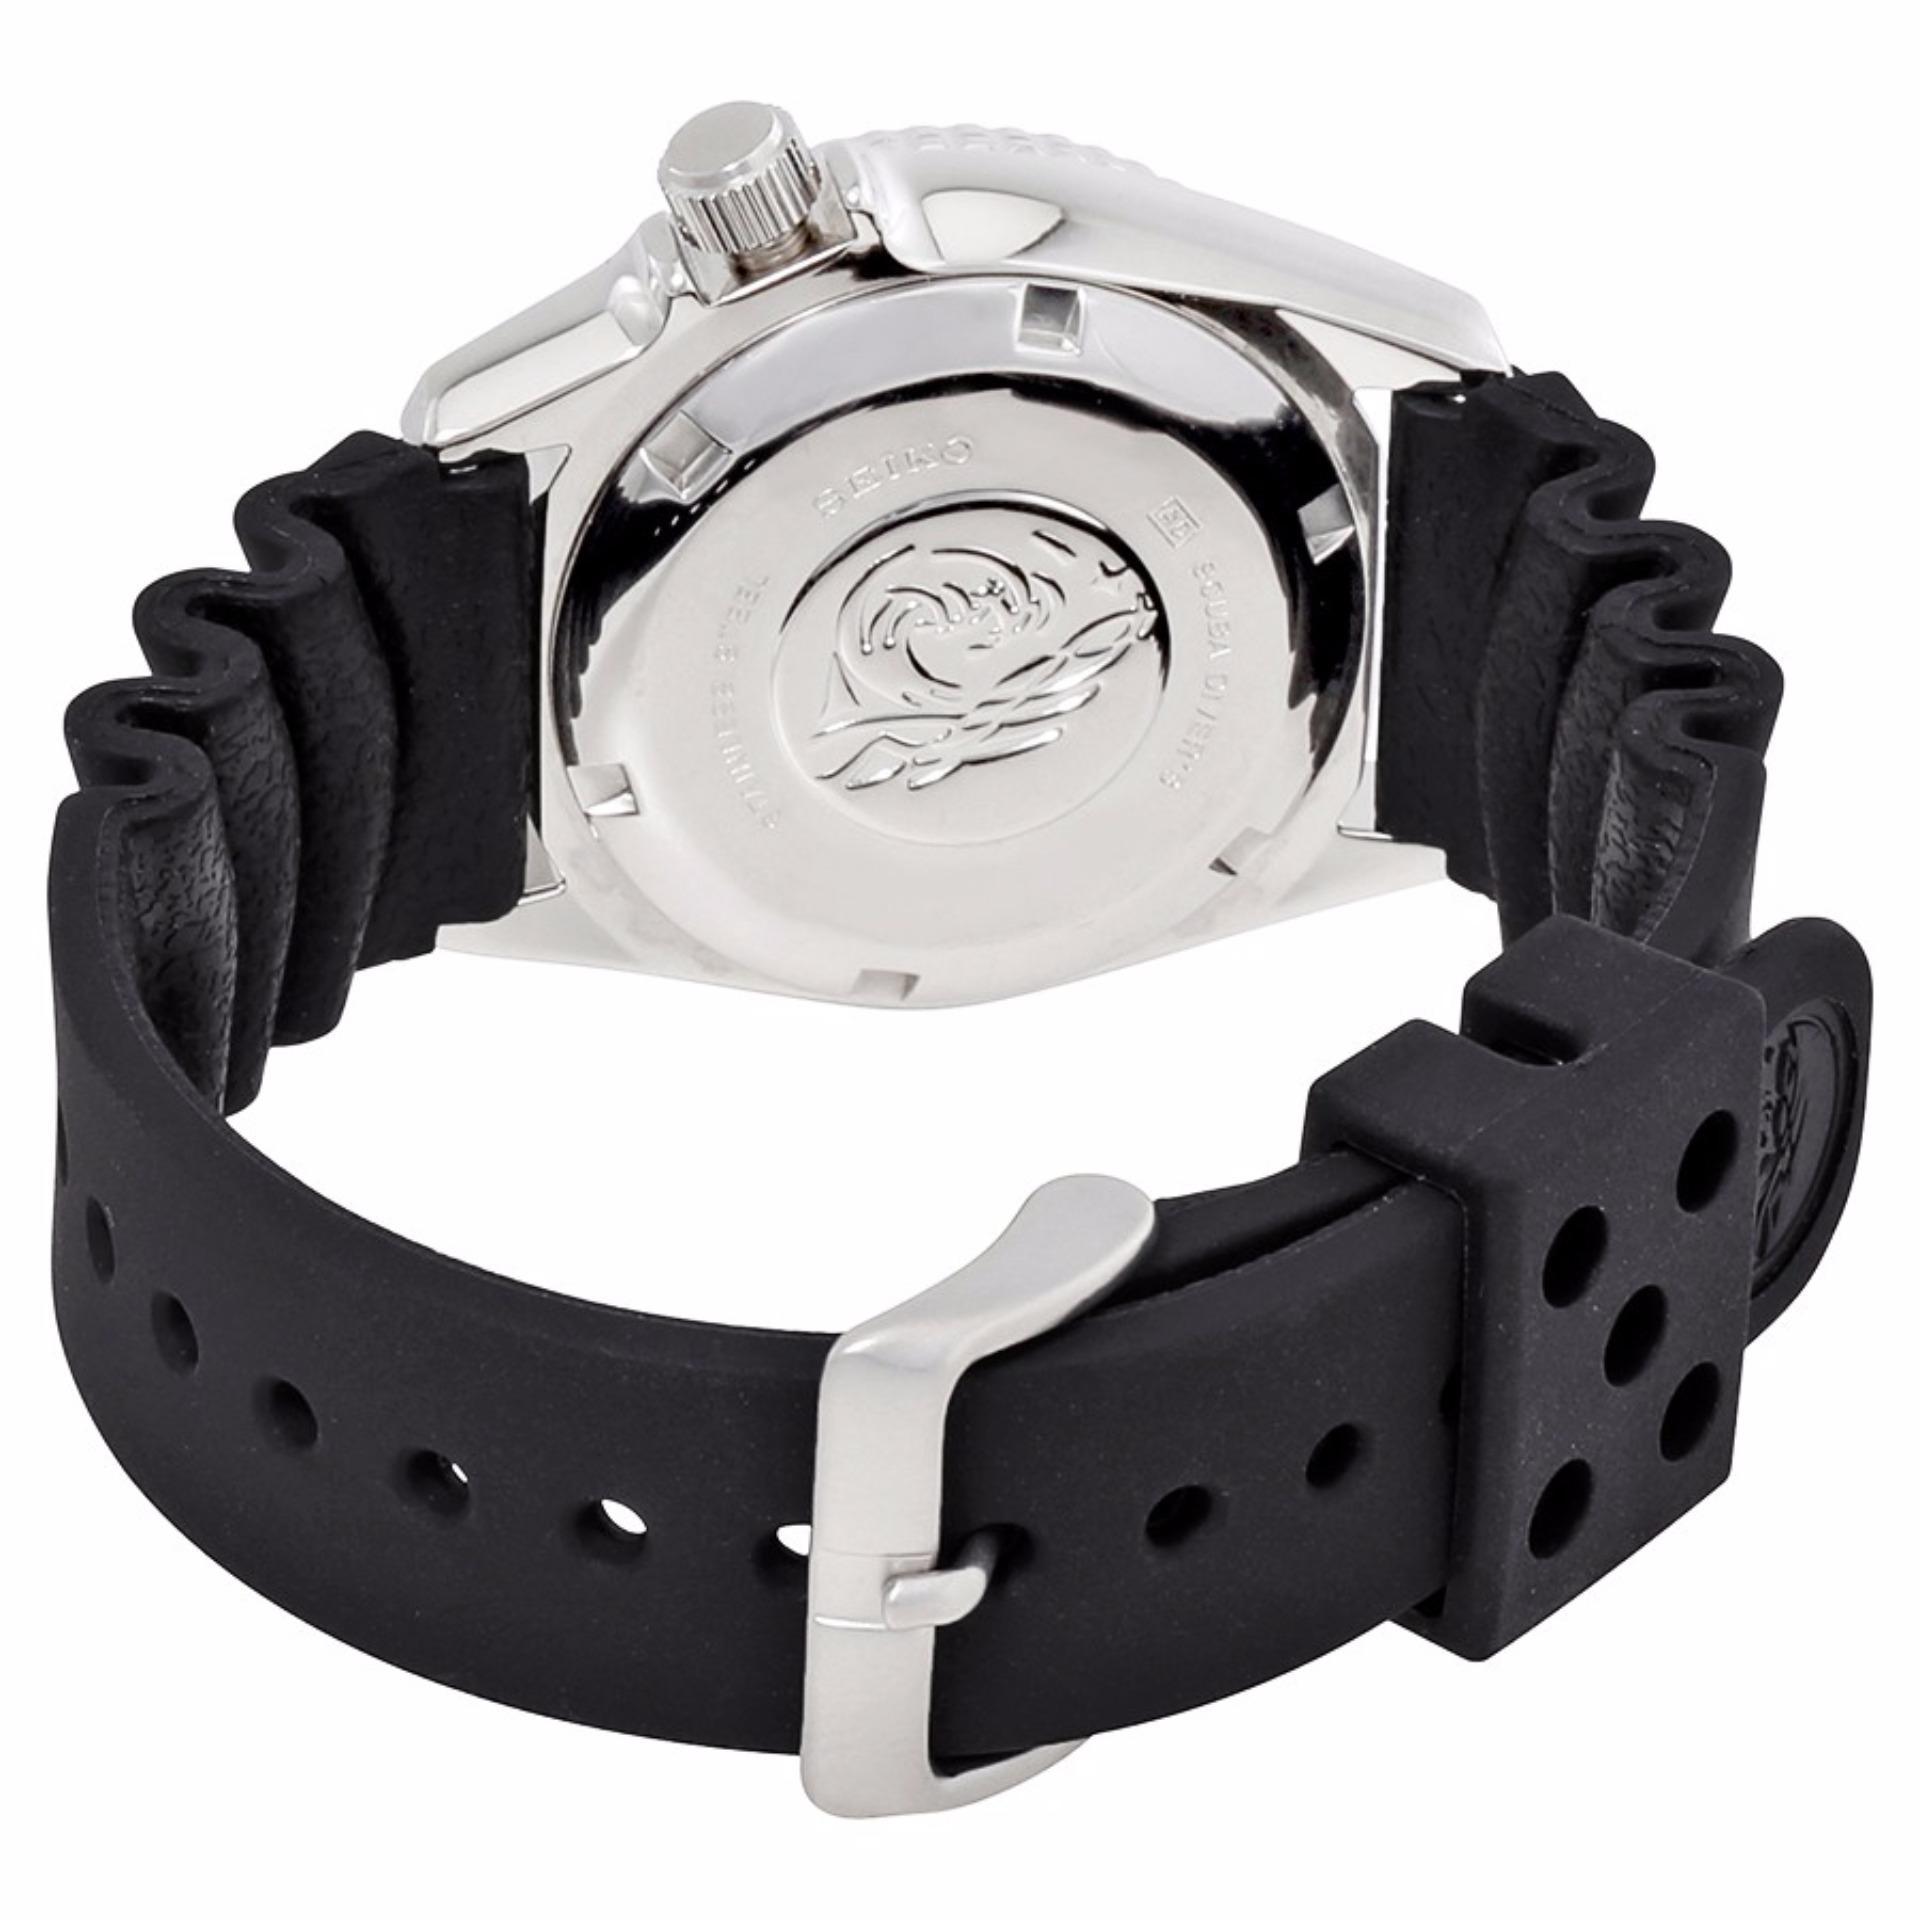 Philippines Seiko Divers Medium Size Junior 200m Black Skx007k2 Automatic Dial Rubber Strap